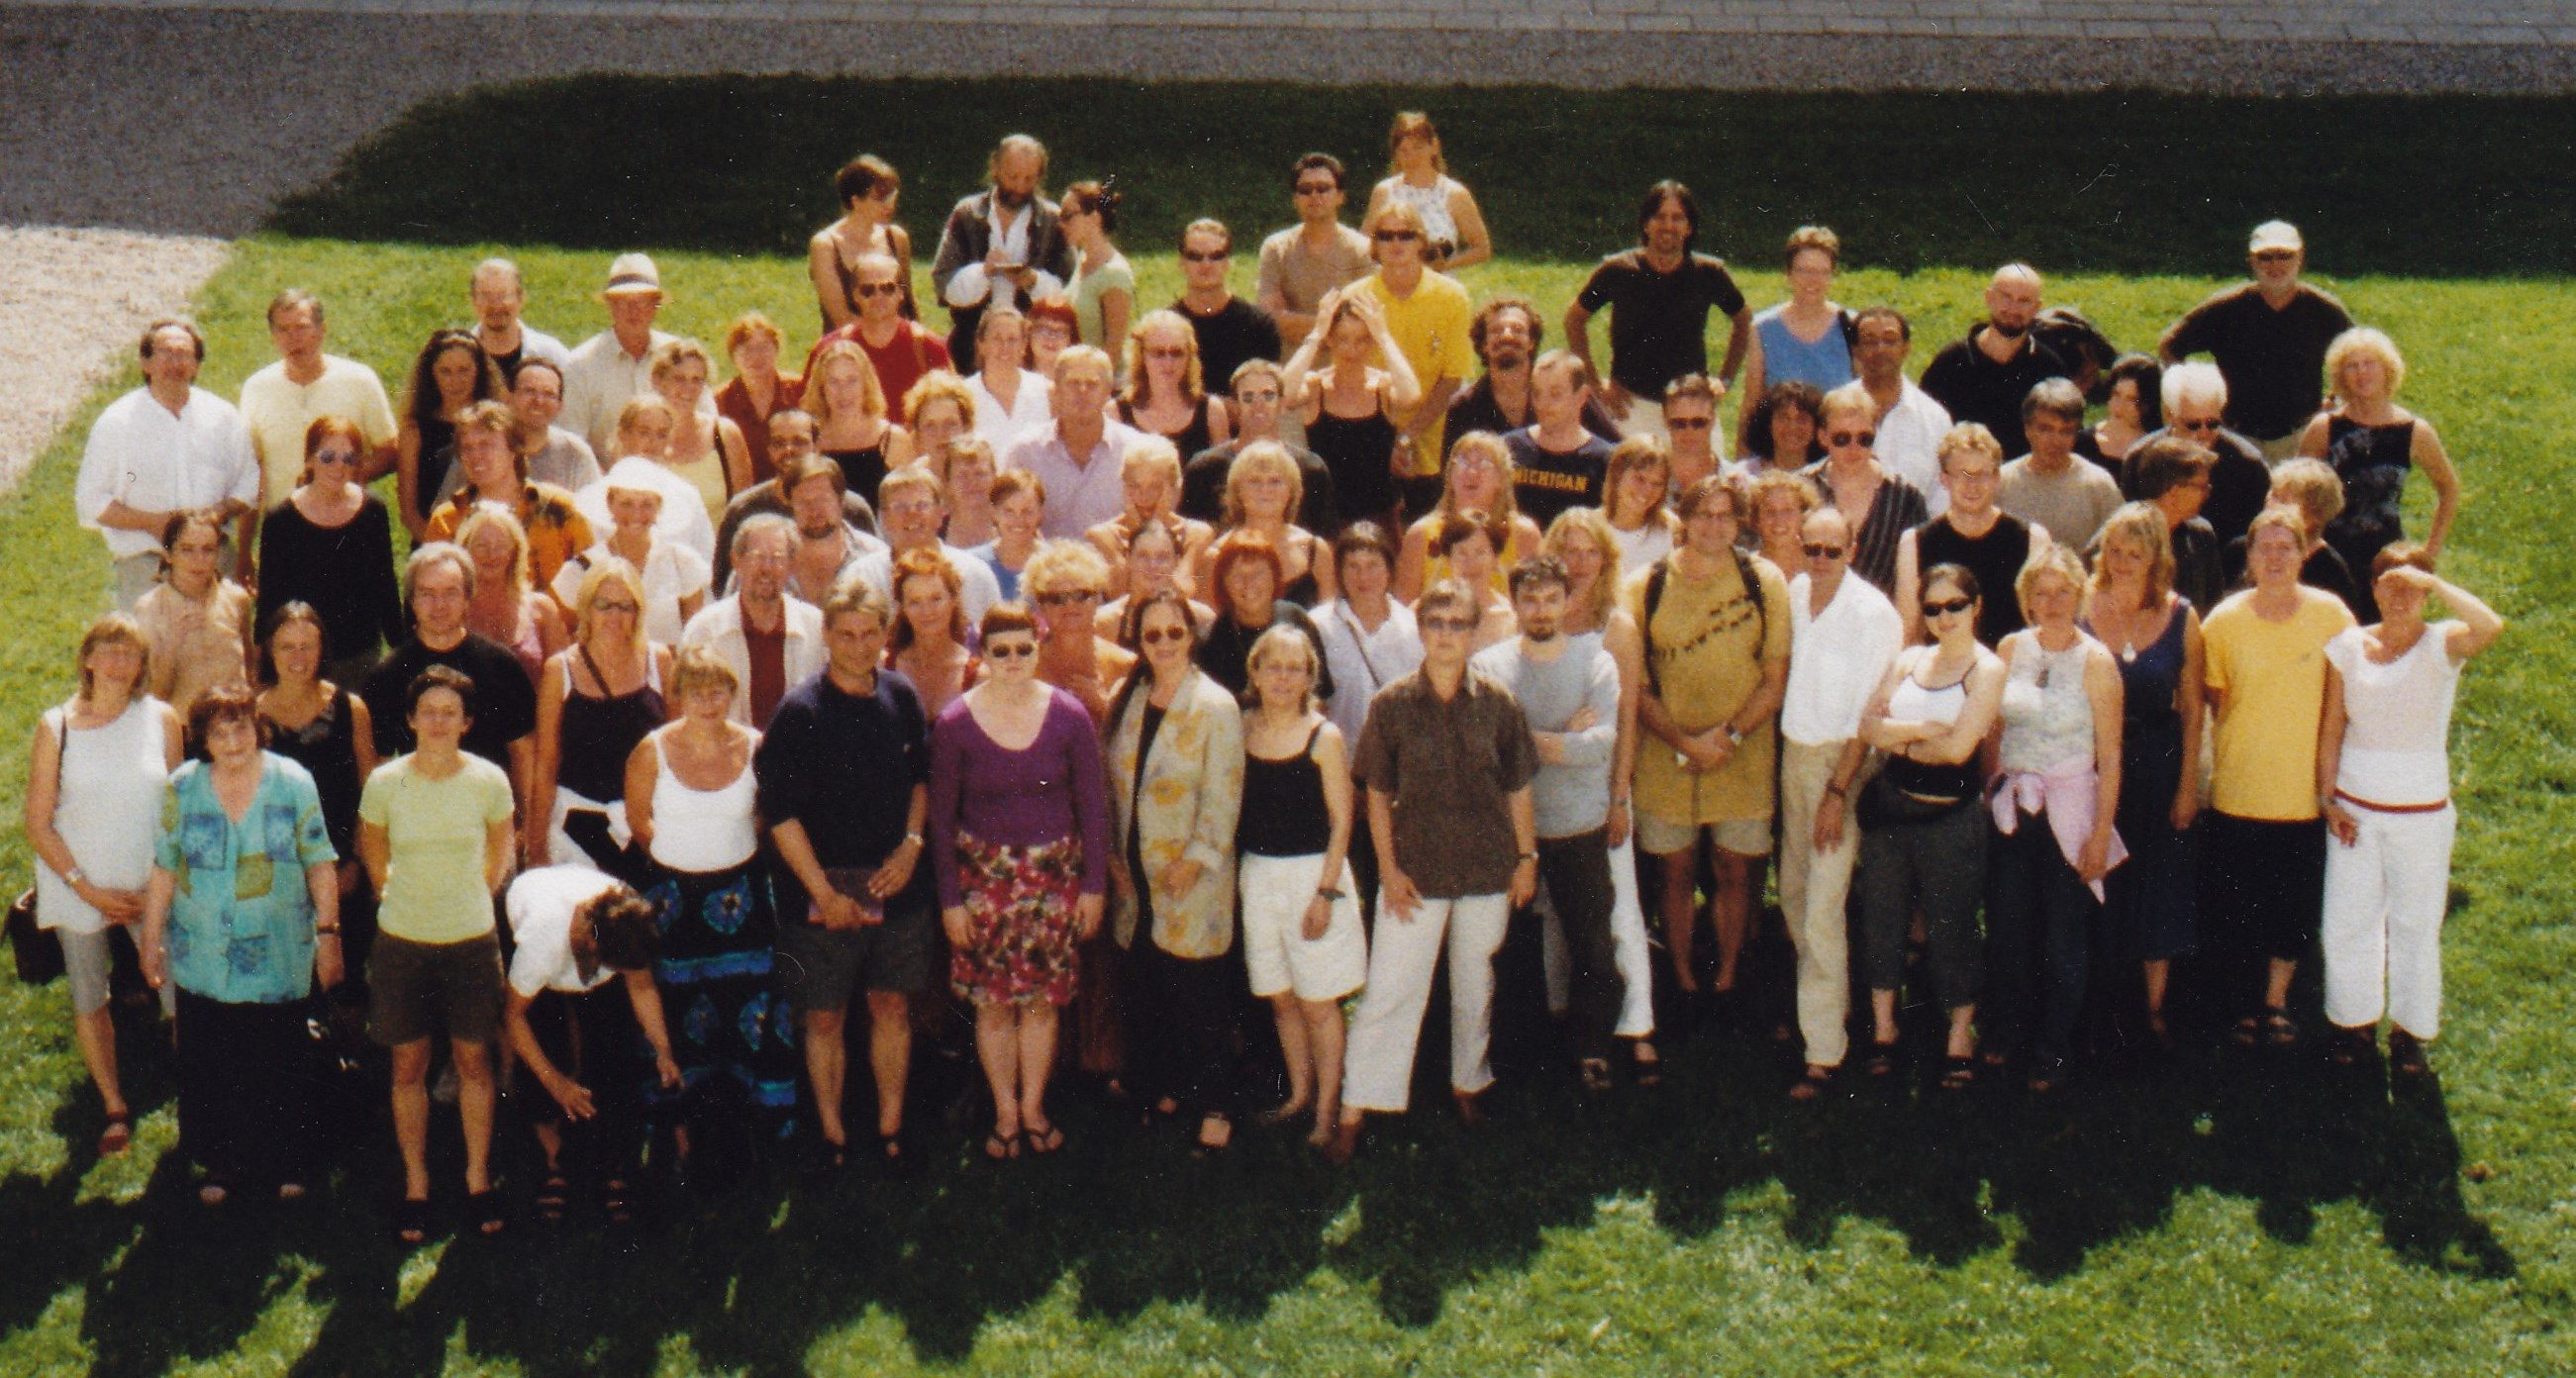 theatre directors and teachers